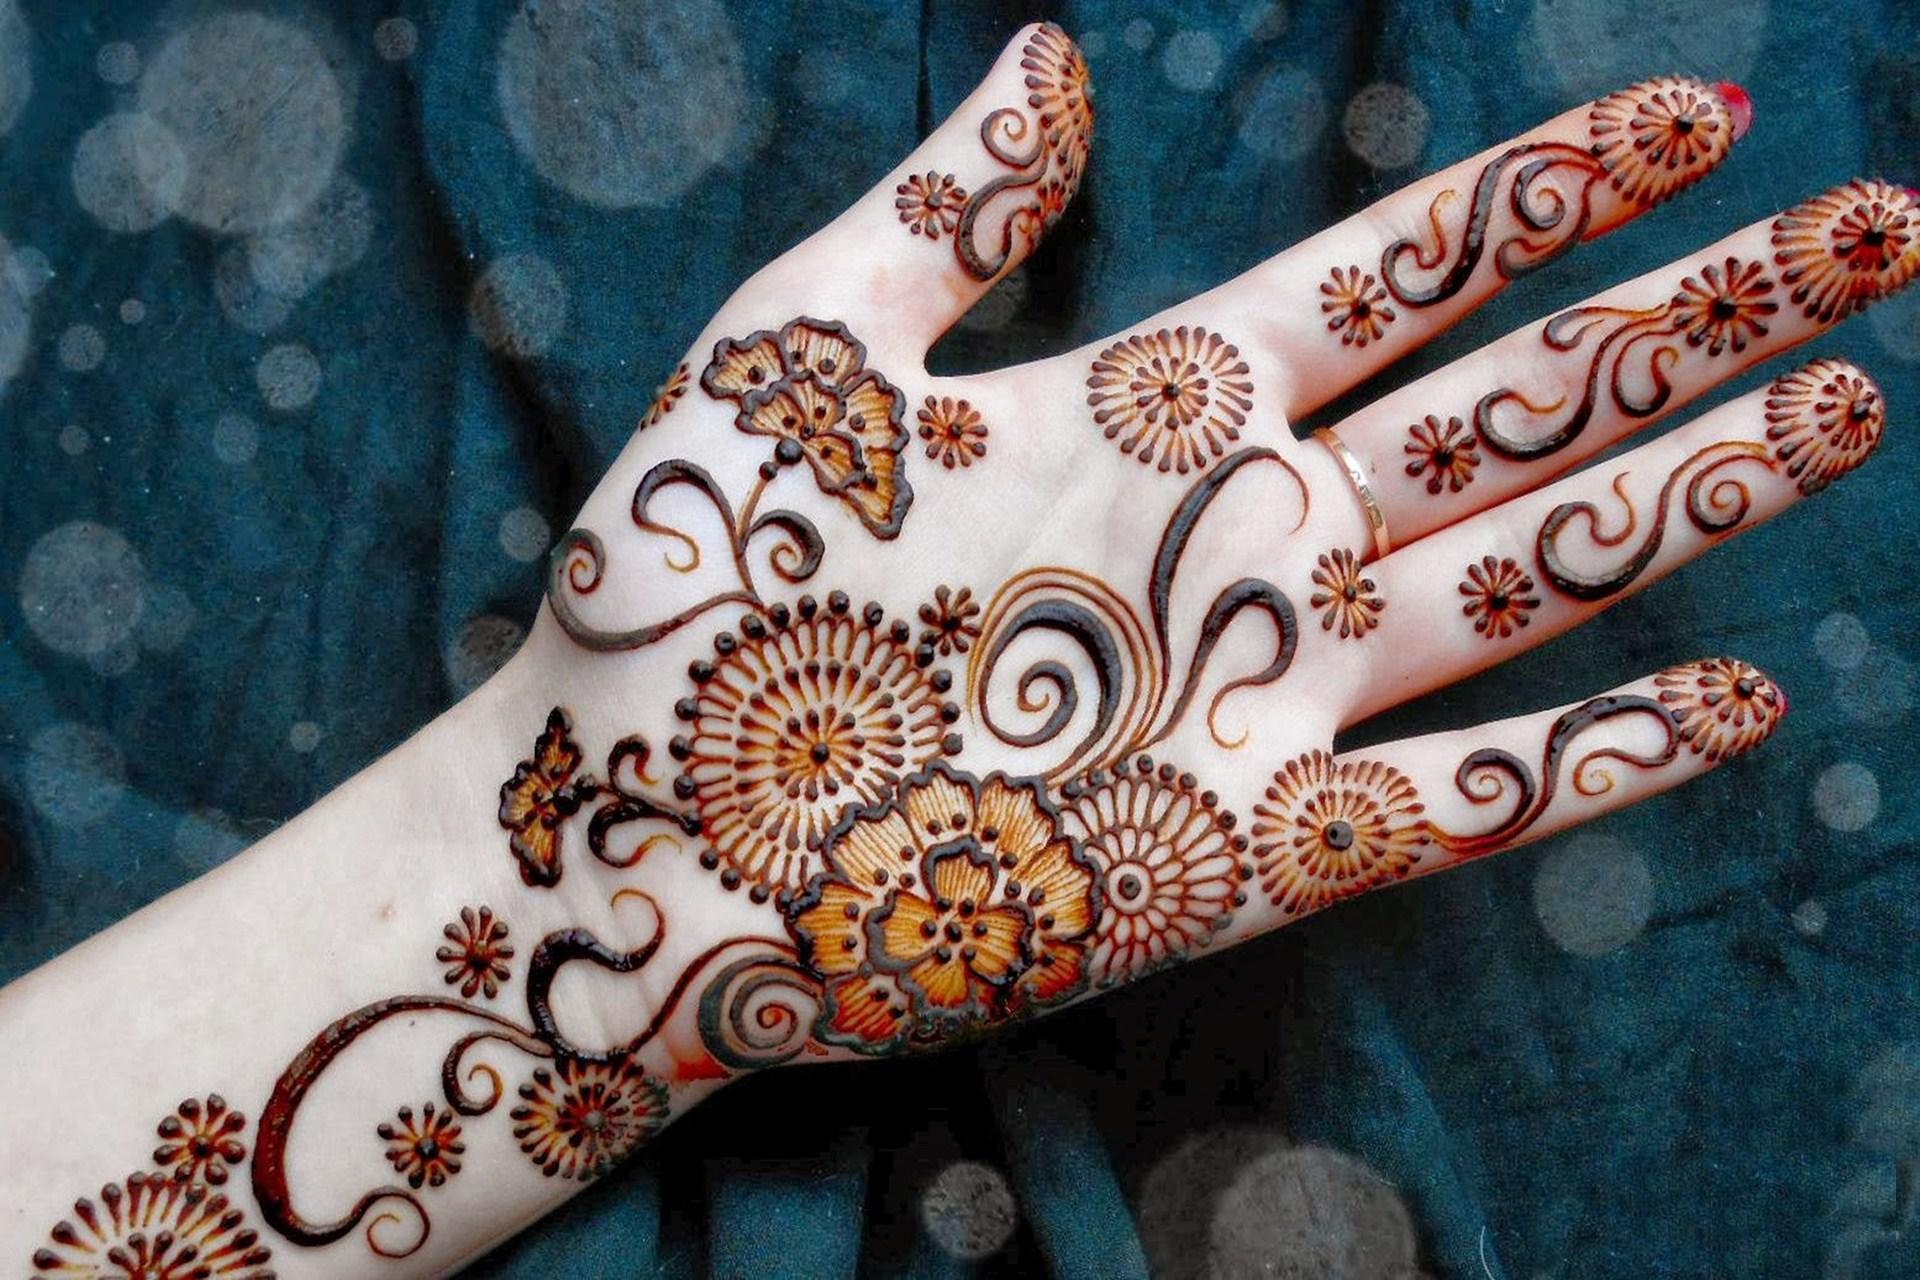 Mehndi Henna Hd : Mehndi design wallpapers pictures images